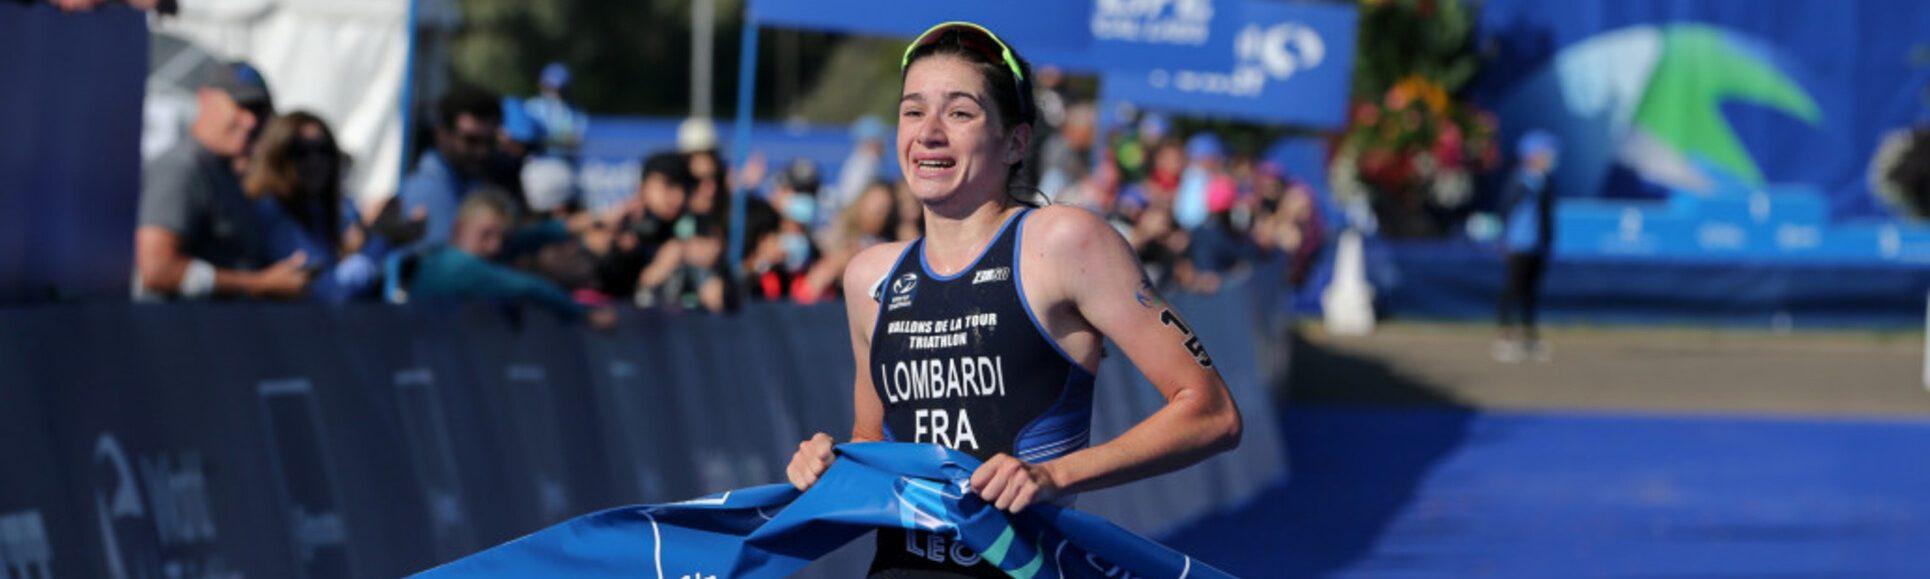 Emma Lombardi est championne du monde U23 en triathlon.